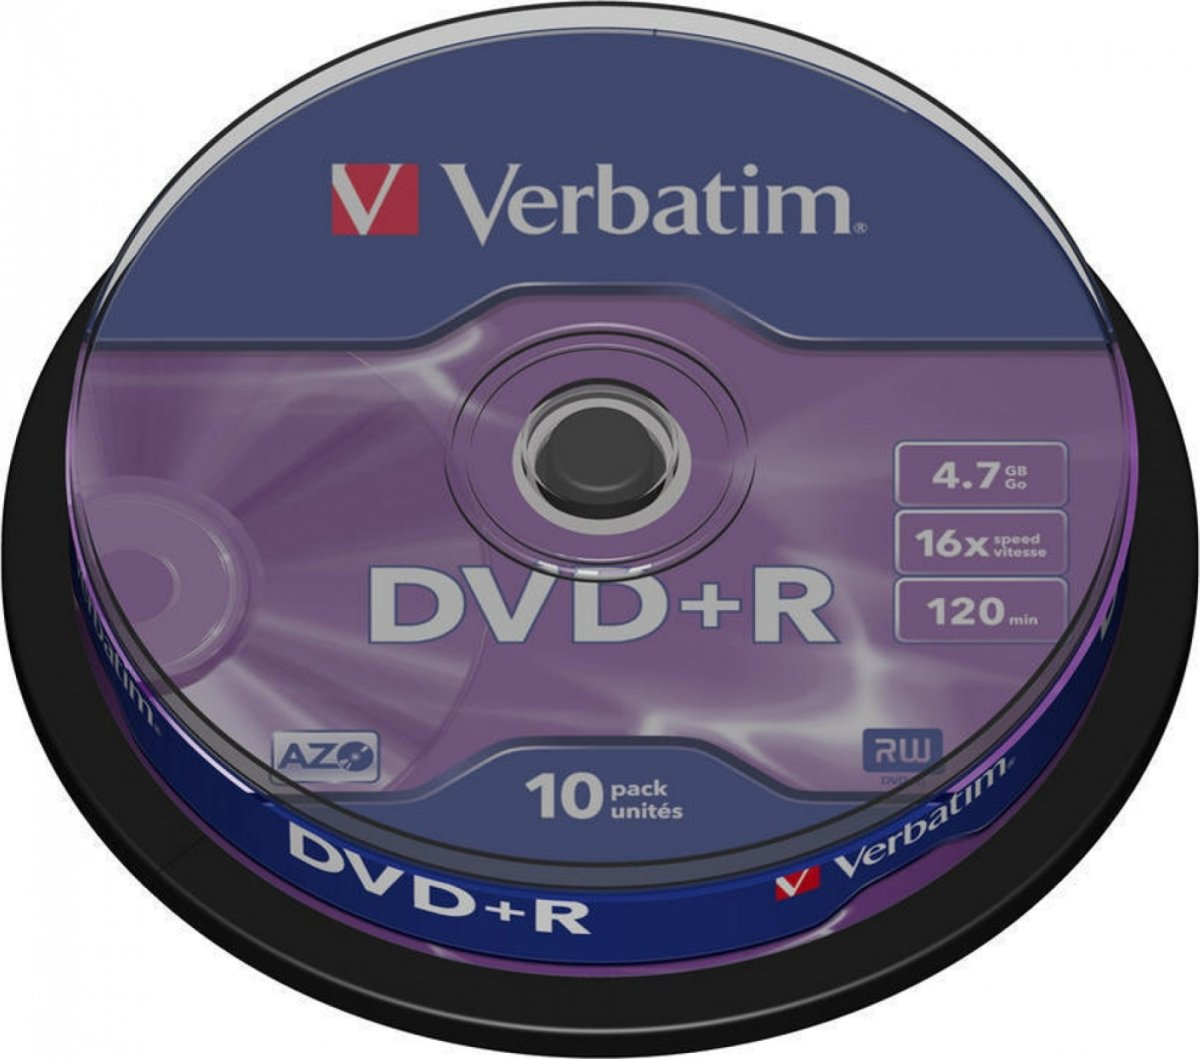 Verbatim DVD+R 16x 4,7GB spindel, 10 stk